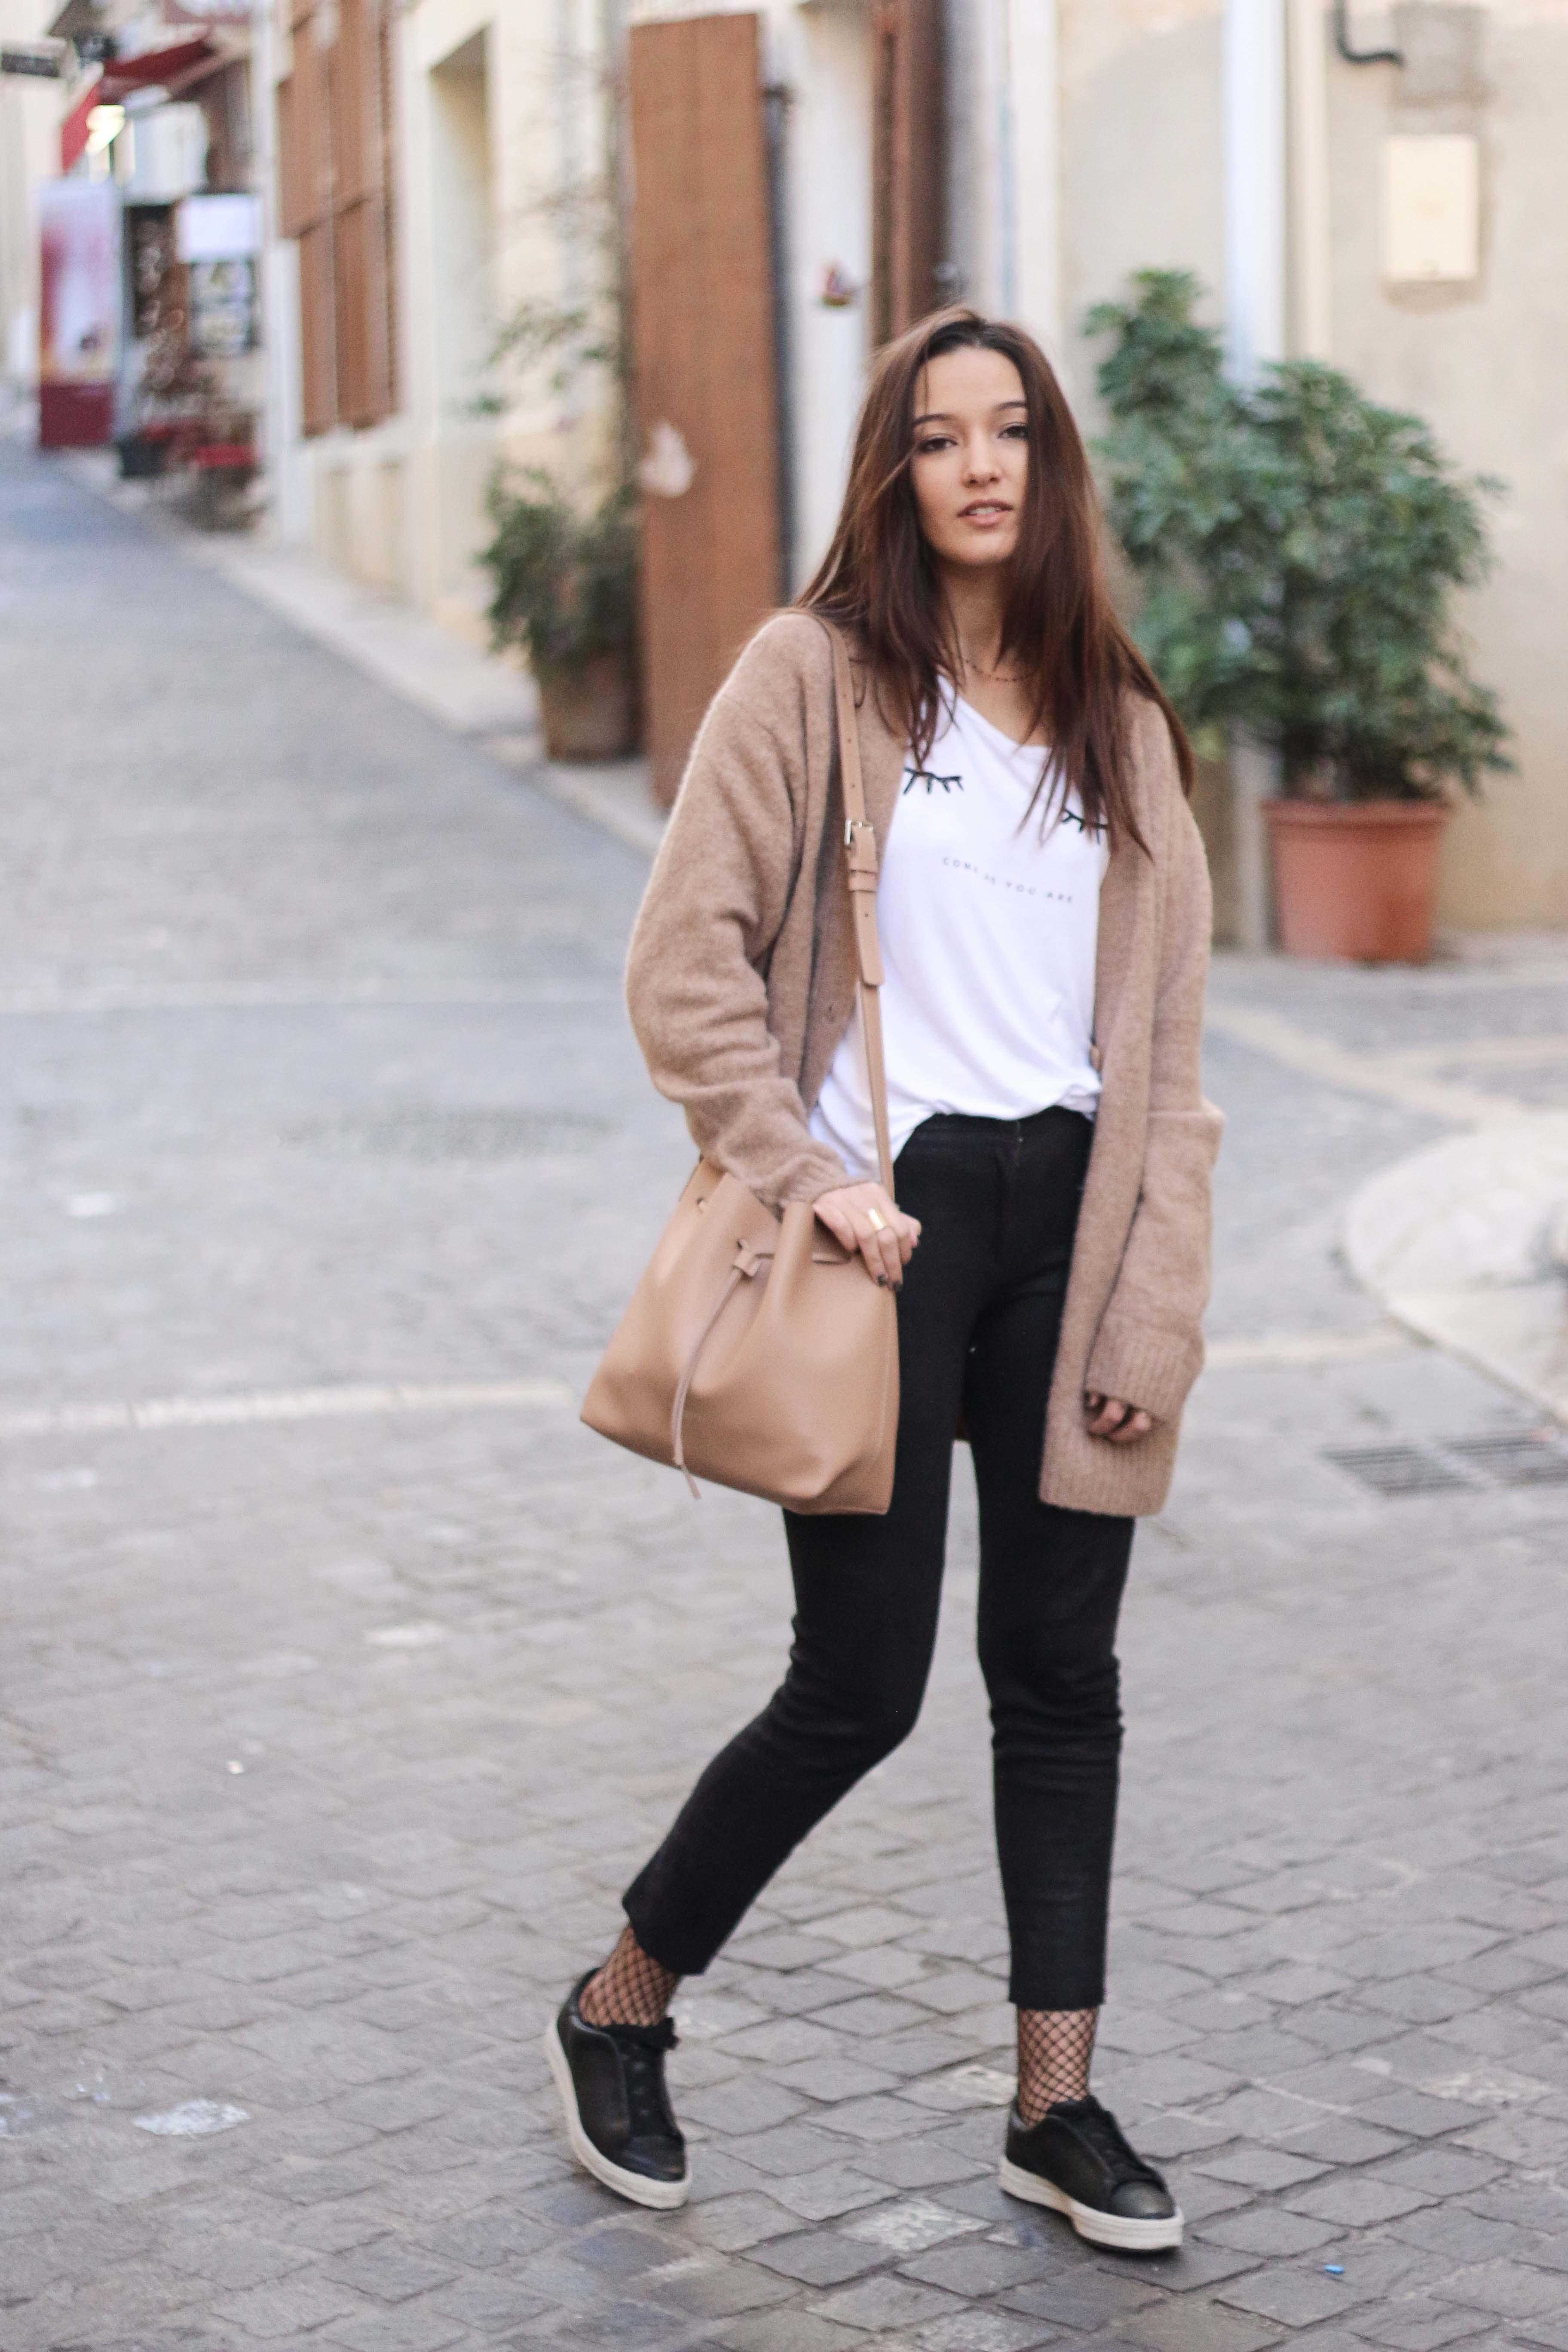 blog-mode-gilet-camel-hm